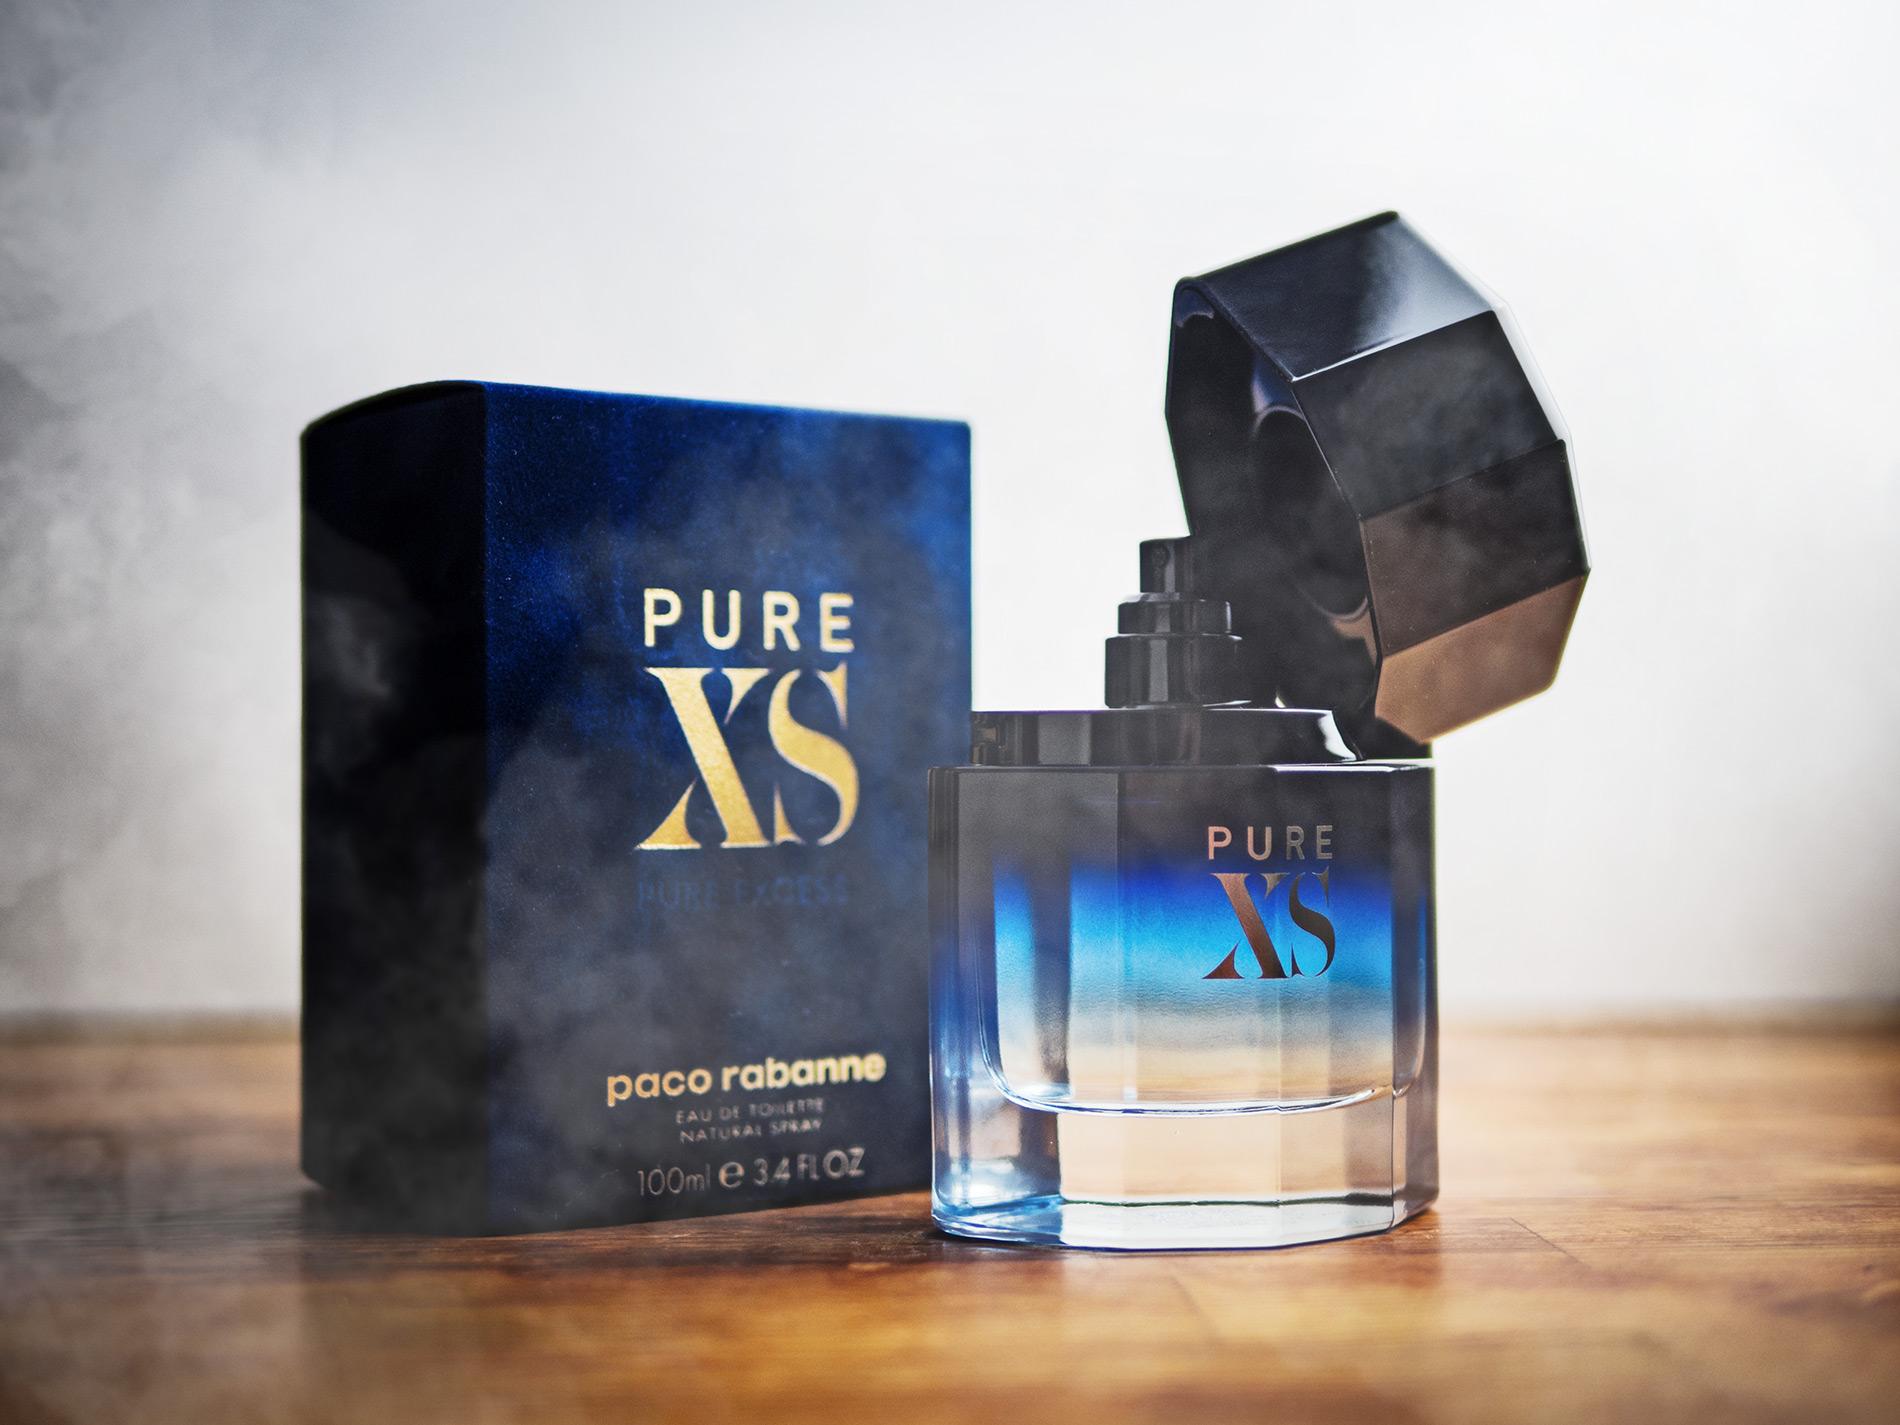 Paco Rabanne, Pure XS, Produktreview, Parfüm, Herrenparfüm, Duft, Duftklassiker, Men, Flaconi, Werbung, sponsored Post